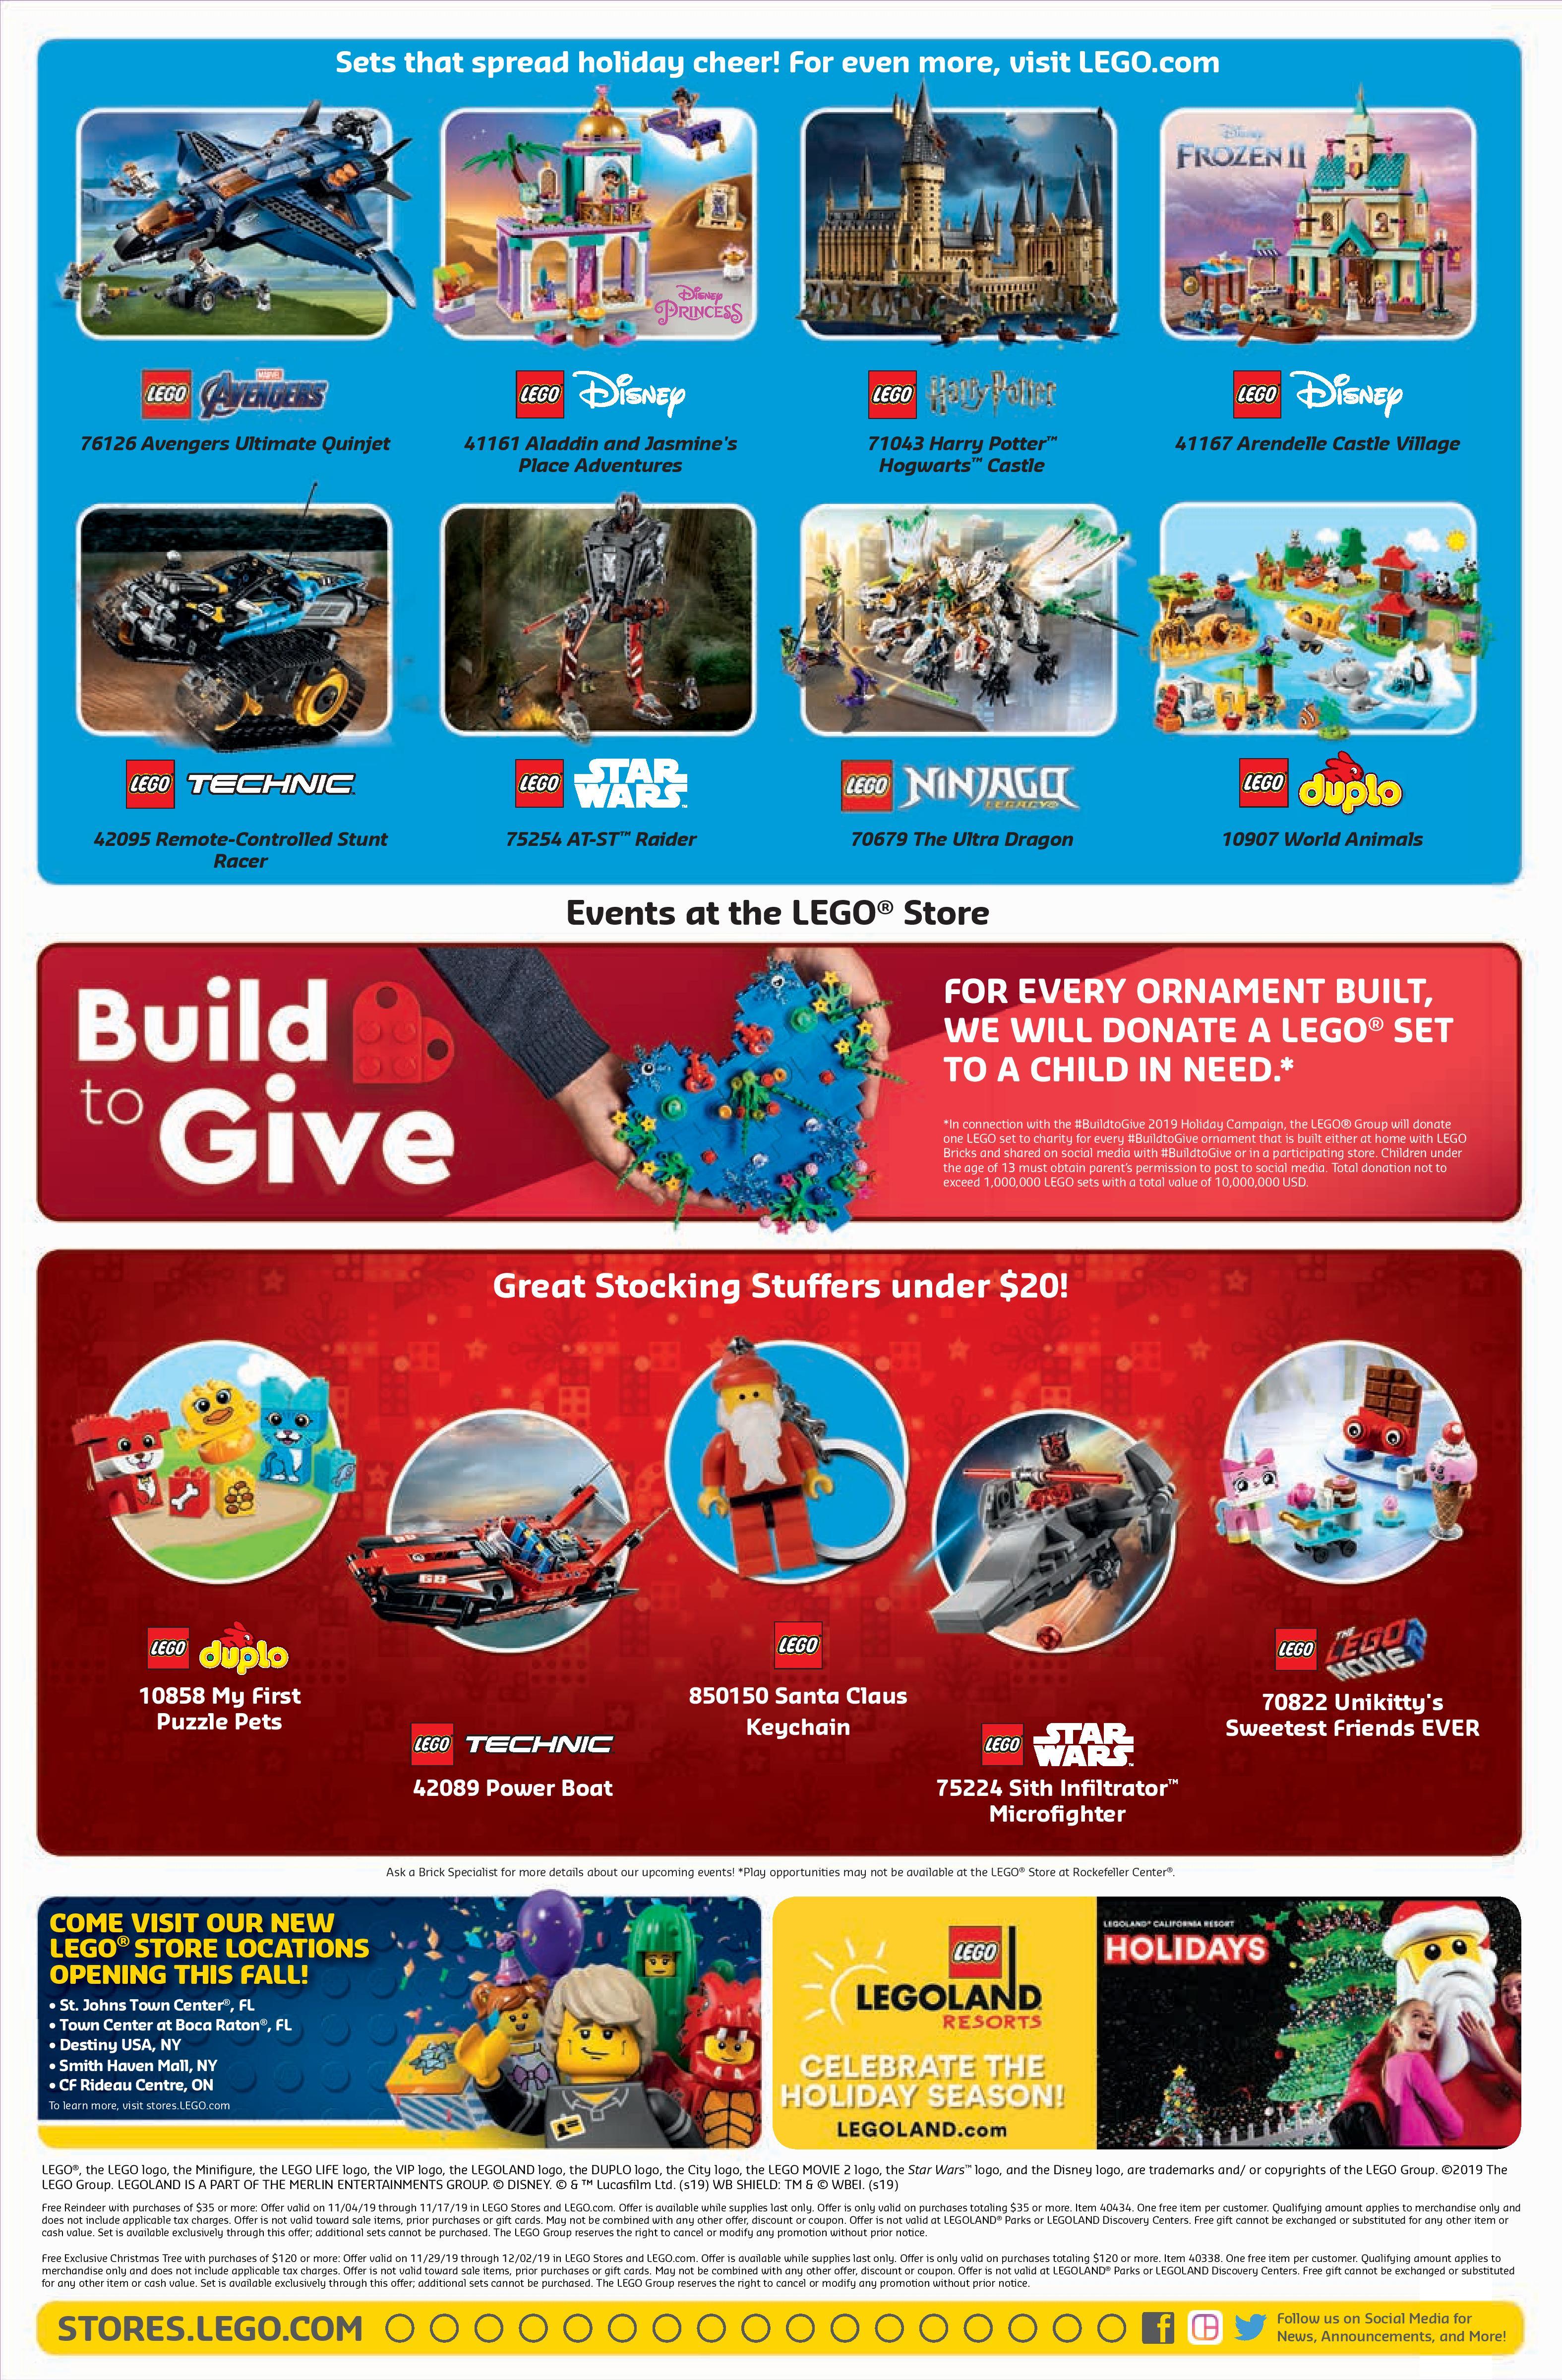 LEGO November 2019 Store Calendar Promotions & Events – The Brick Fan